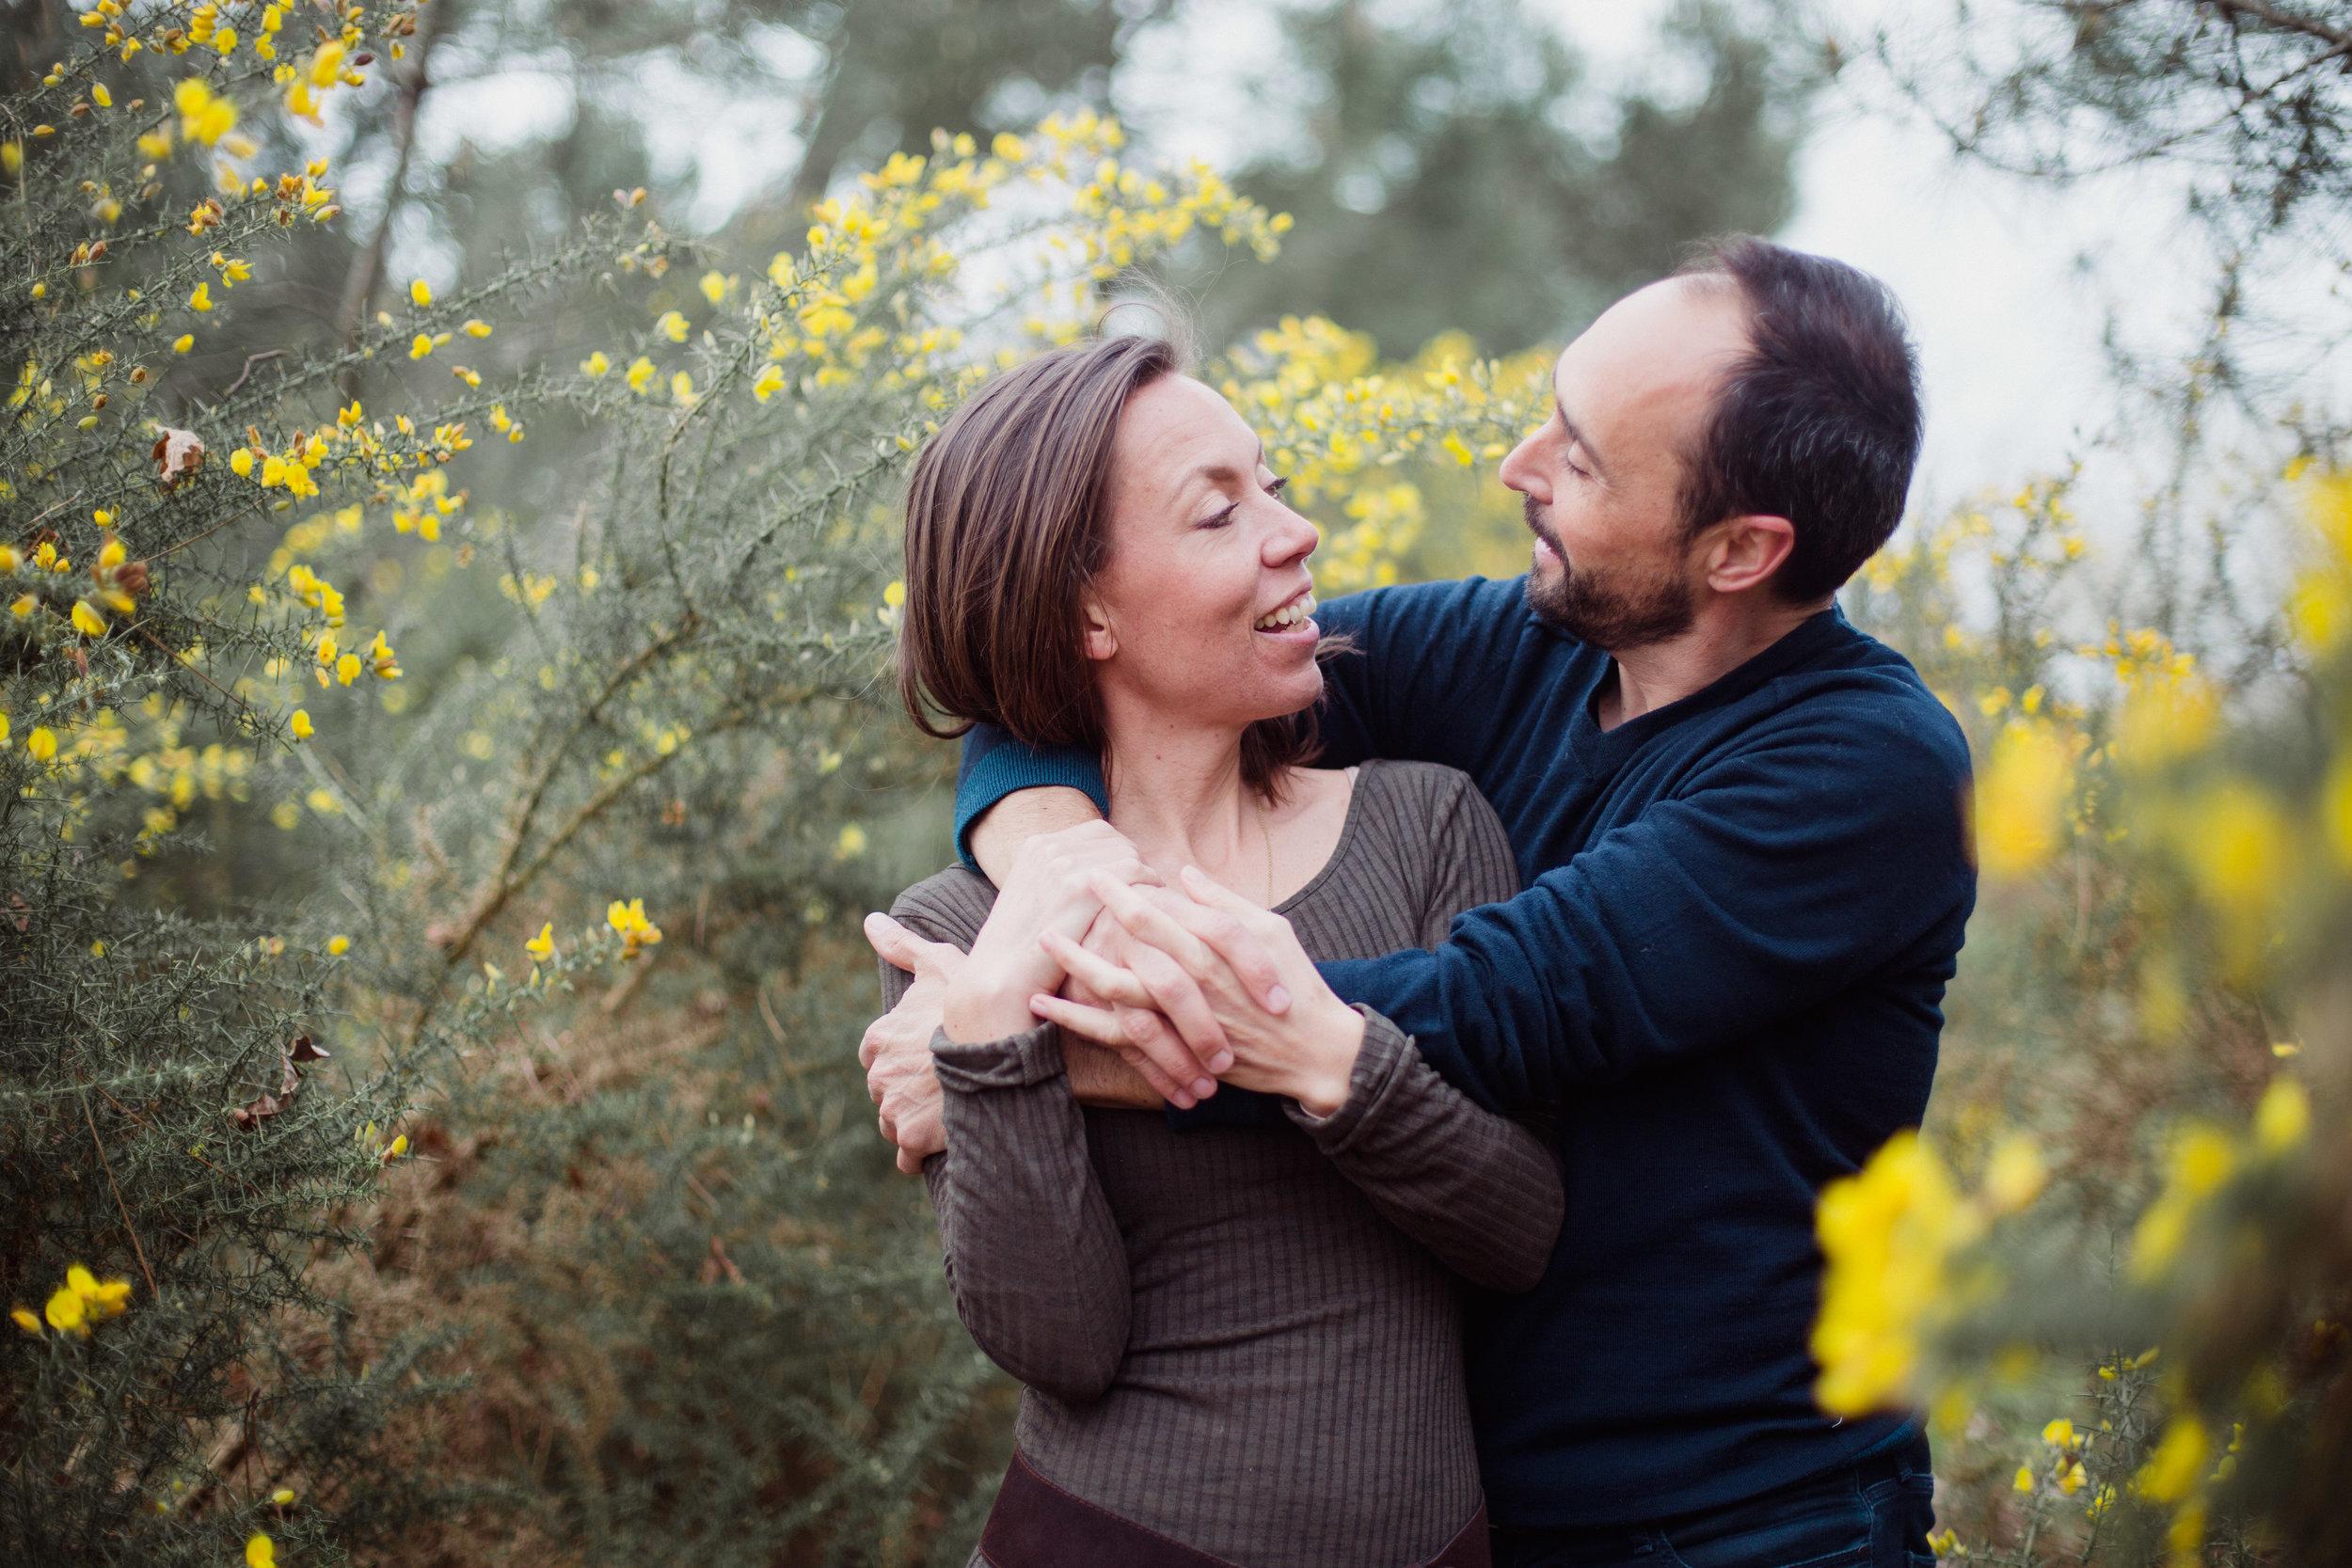 seance-photo-couple-photographe-sud-ouest-pauline-maroussia-p